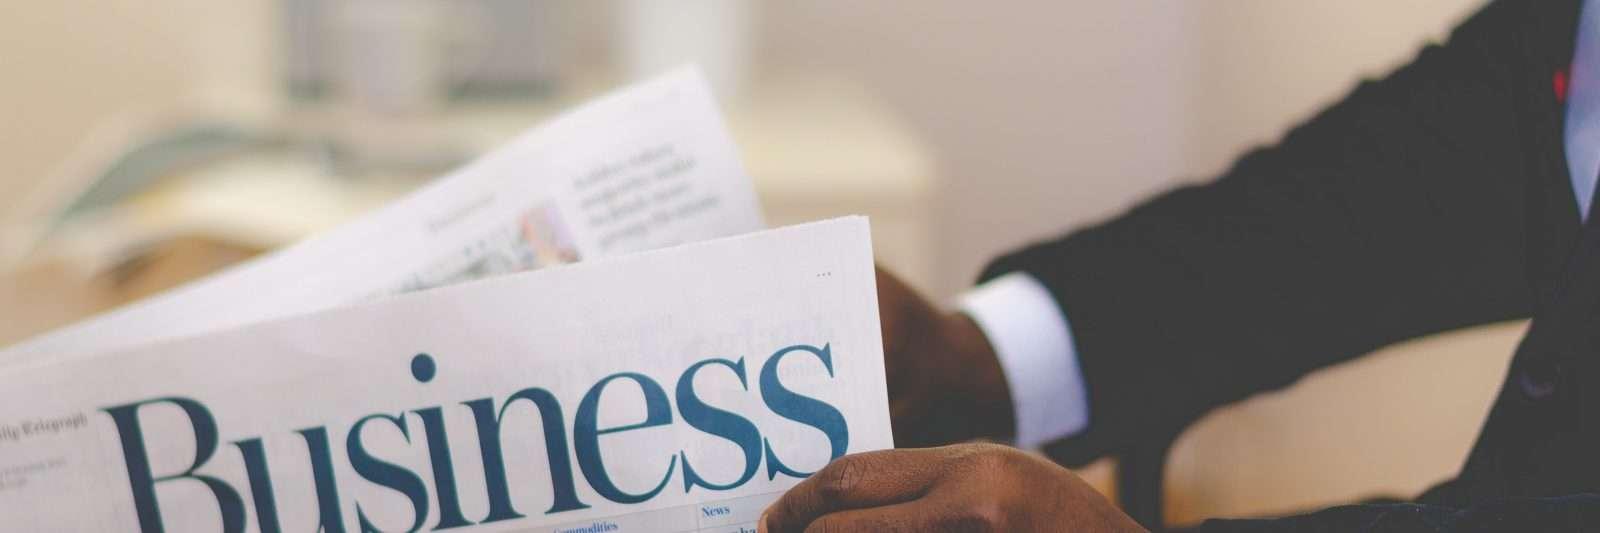 man holding business newspaper